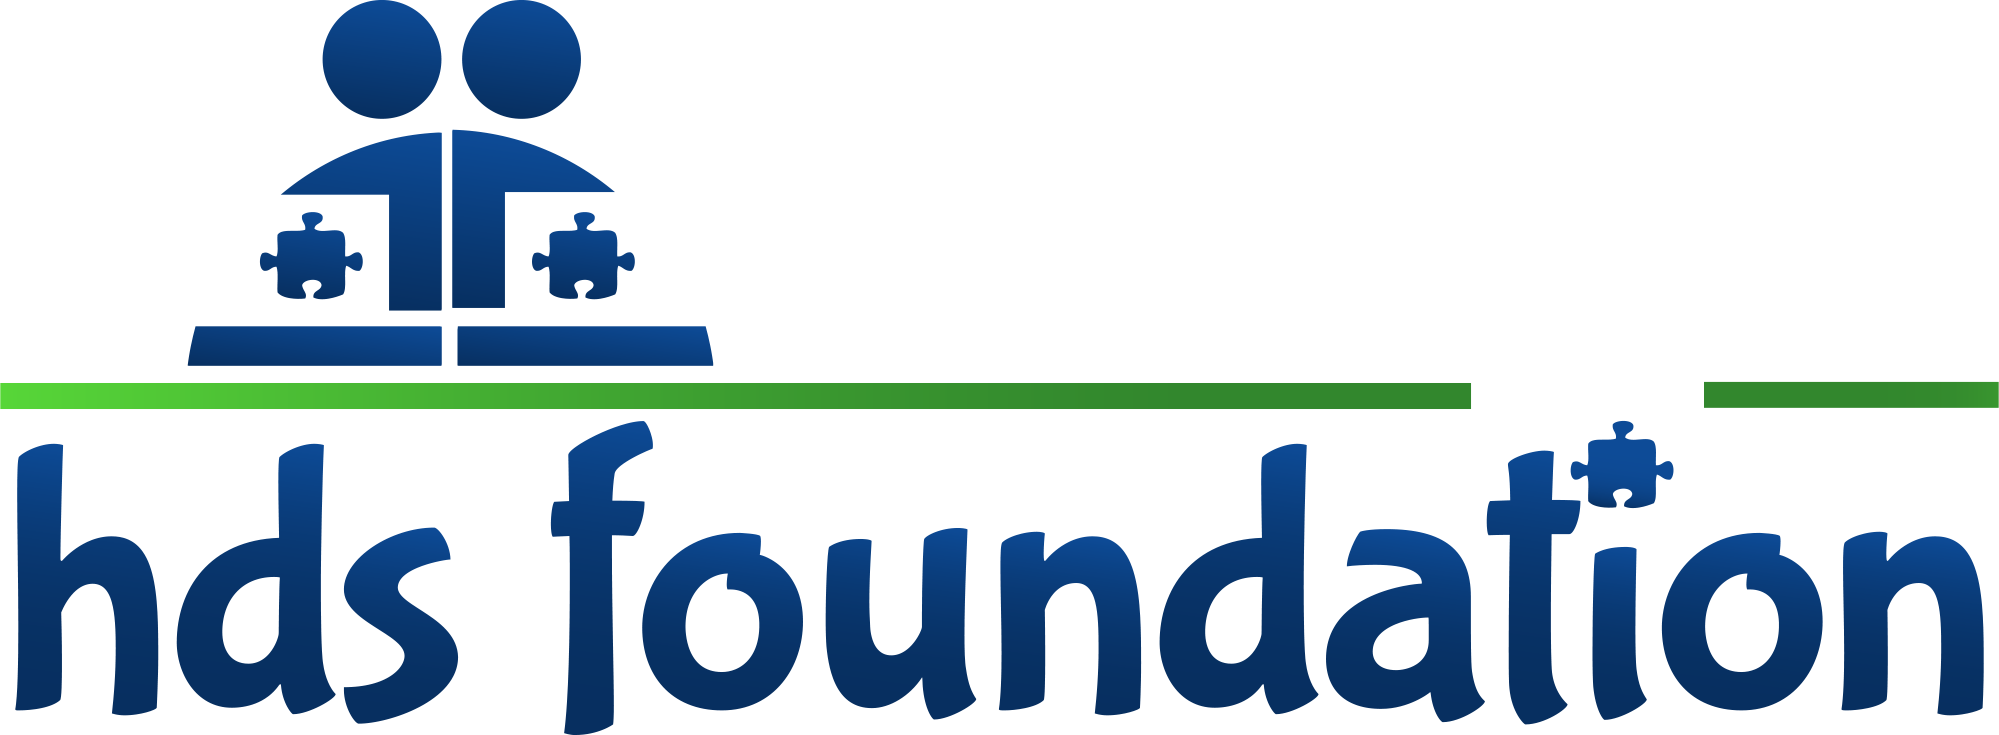 HDS Foundation Logo.png